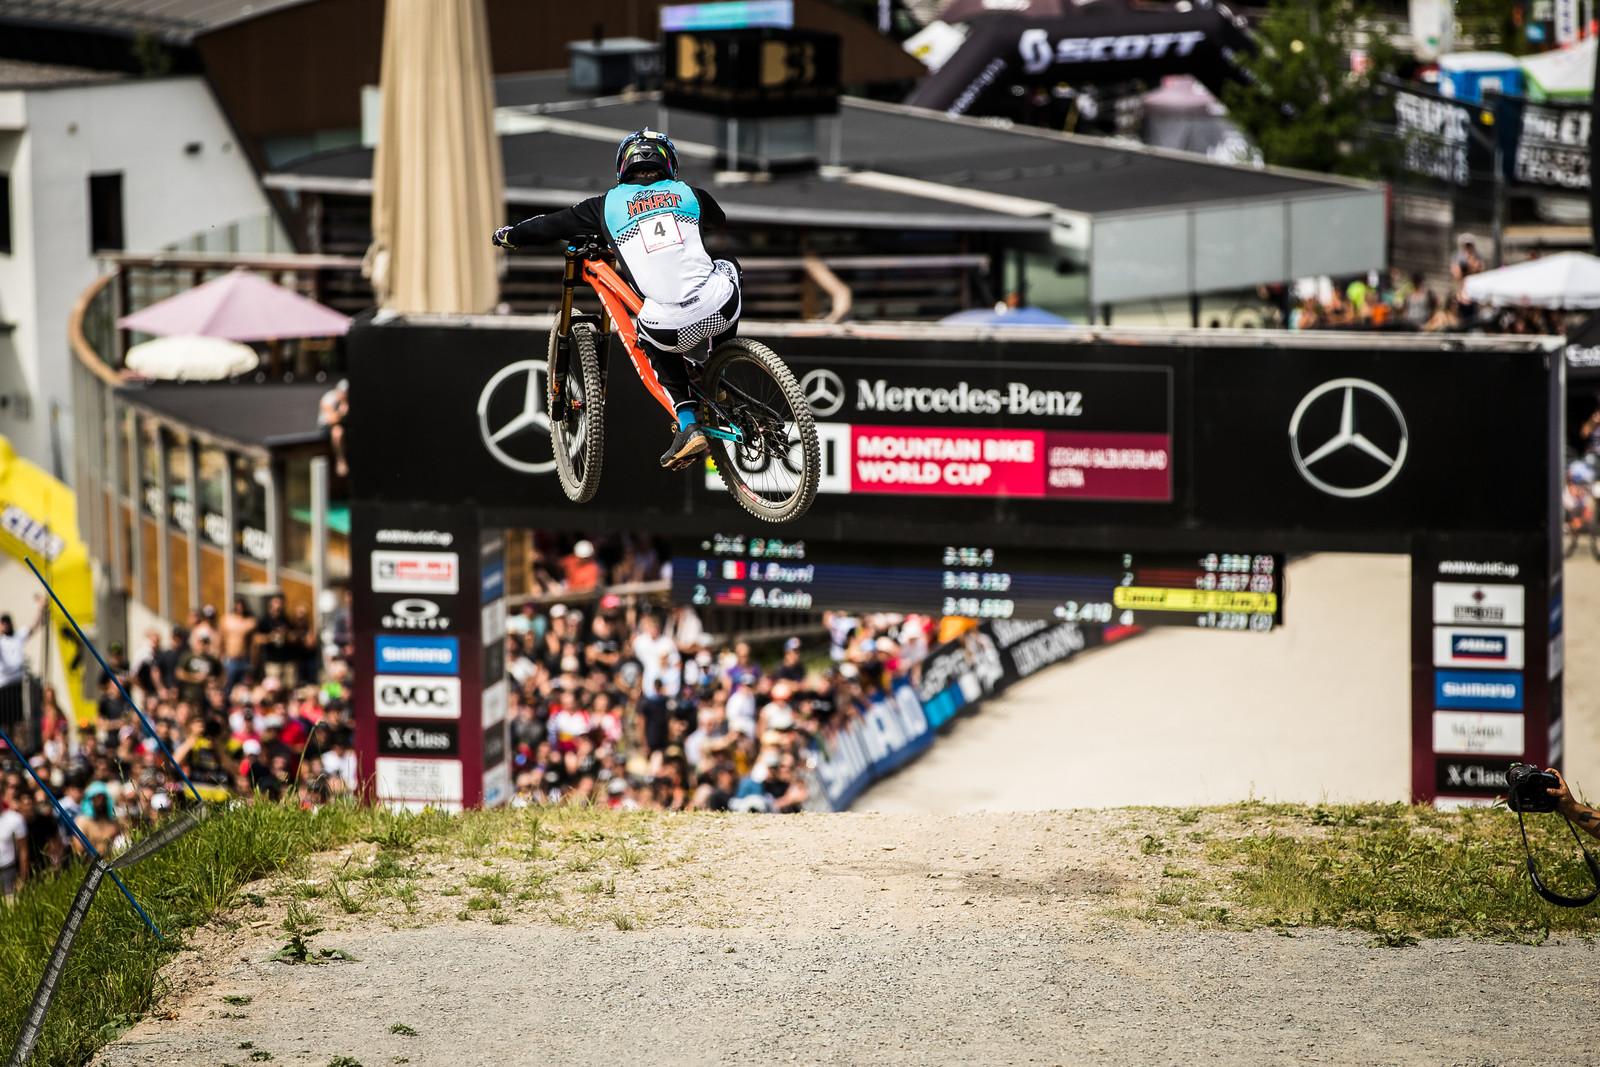 Leogang Leap, Danny Hart - Danny Hart 2019 World Cup Downhill Photos - Mountain Biking Pictures - Vital MTB